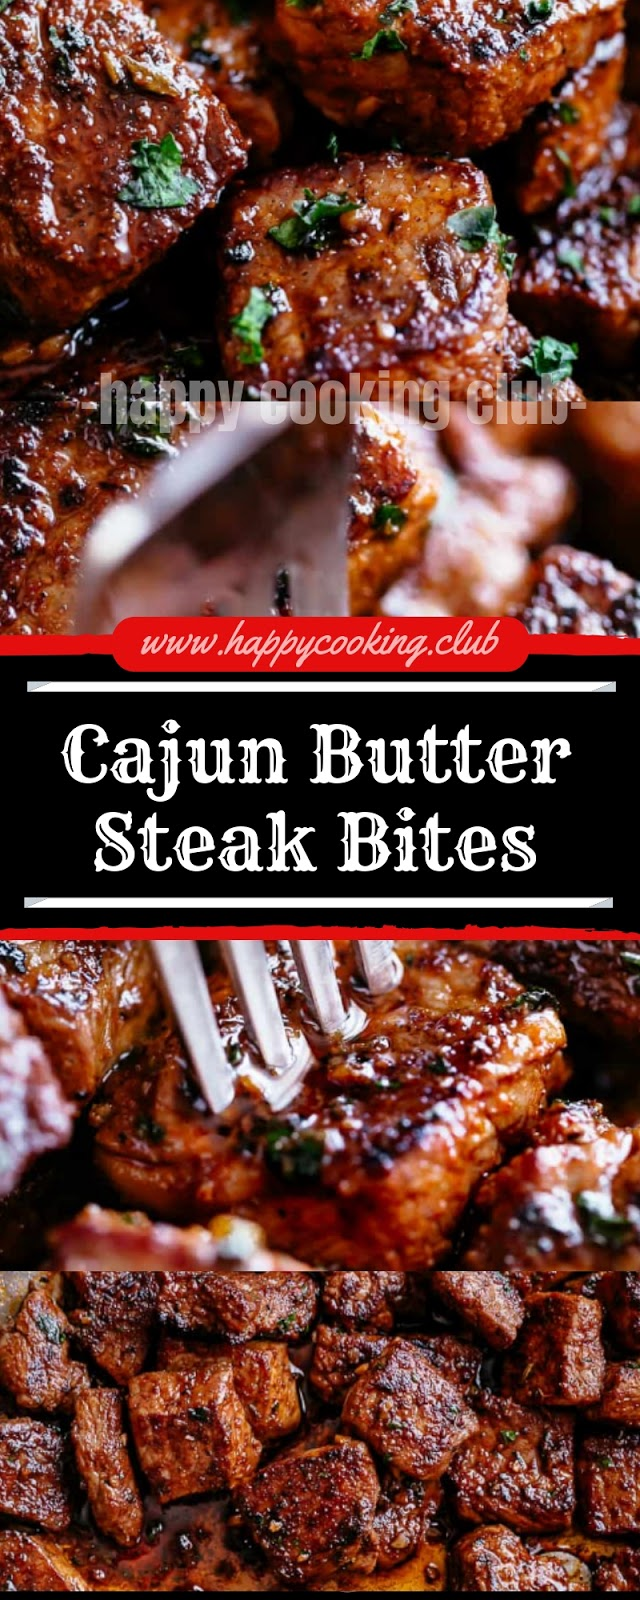 Cajun Butter Steak Bites